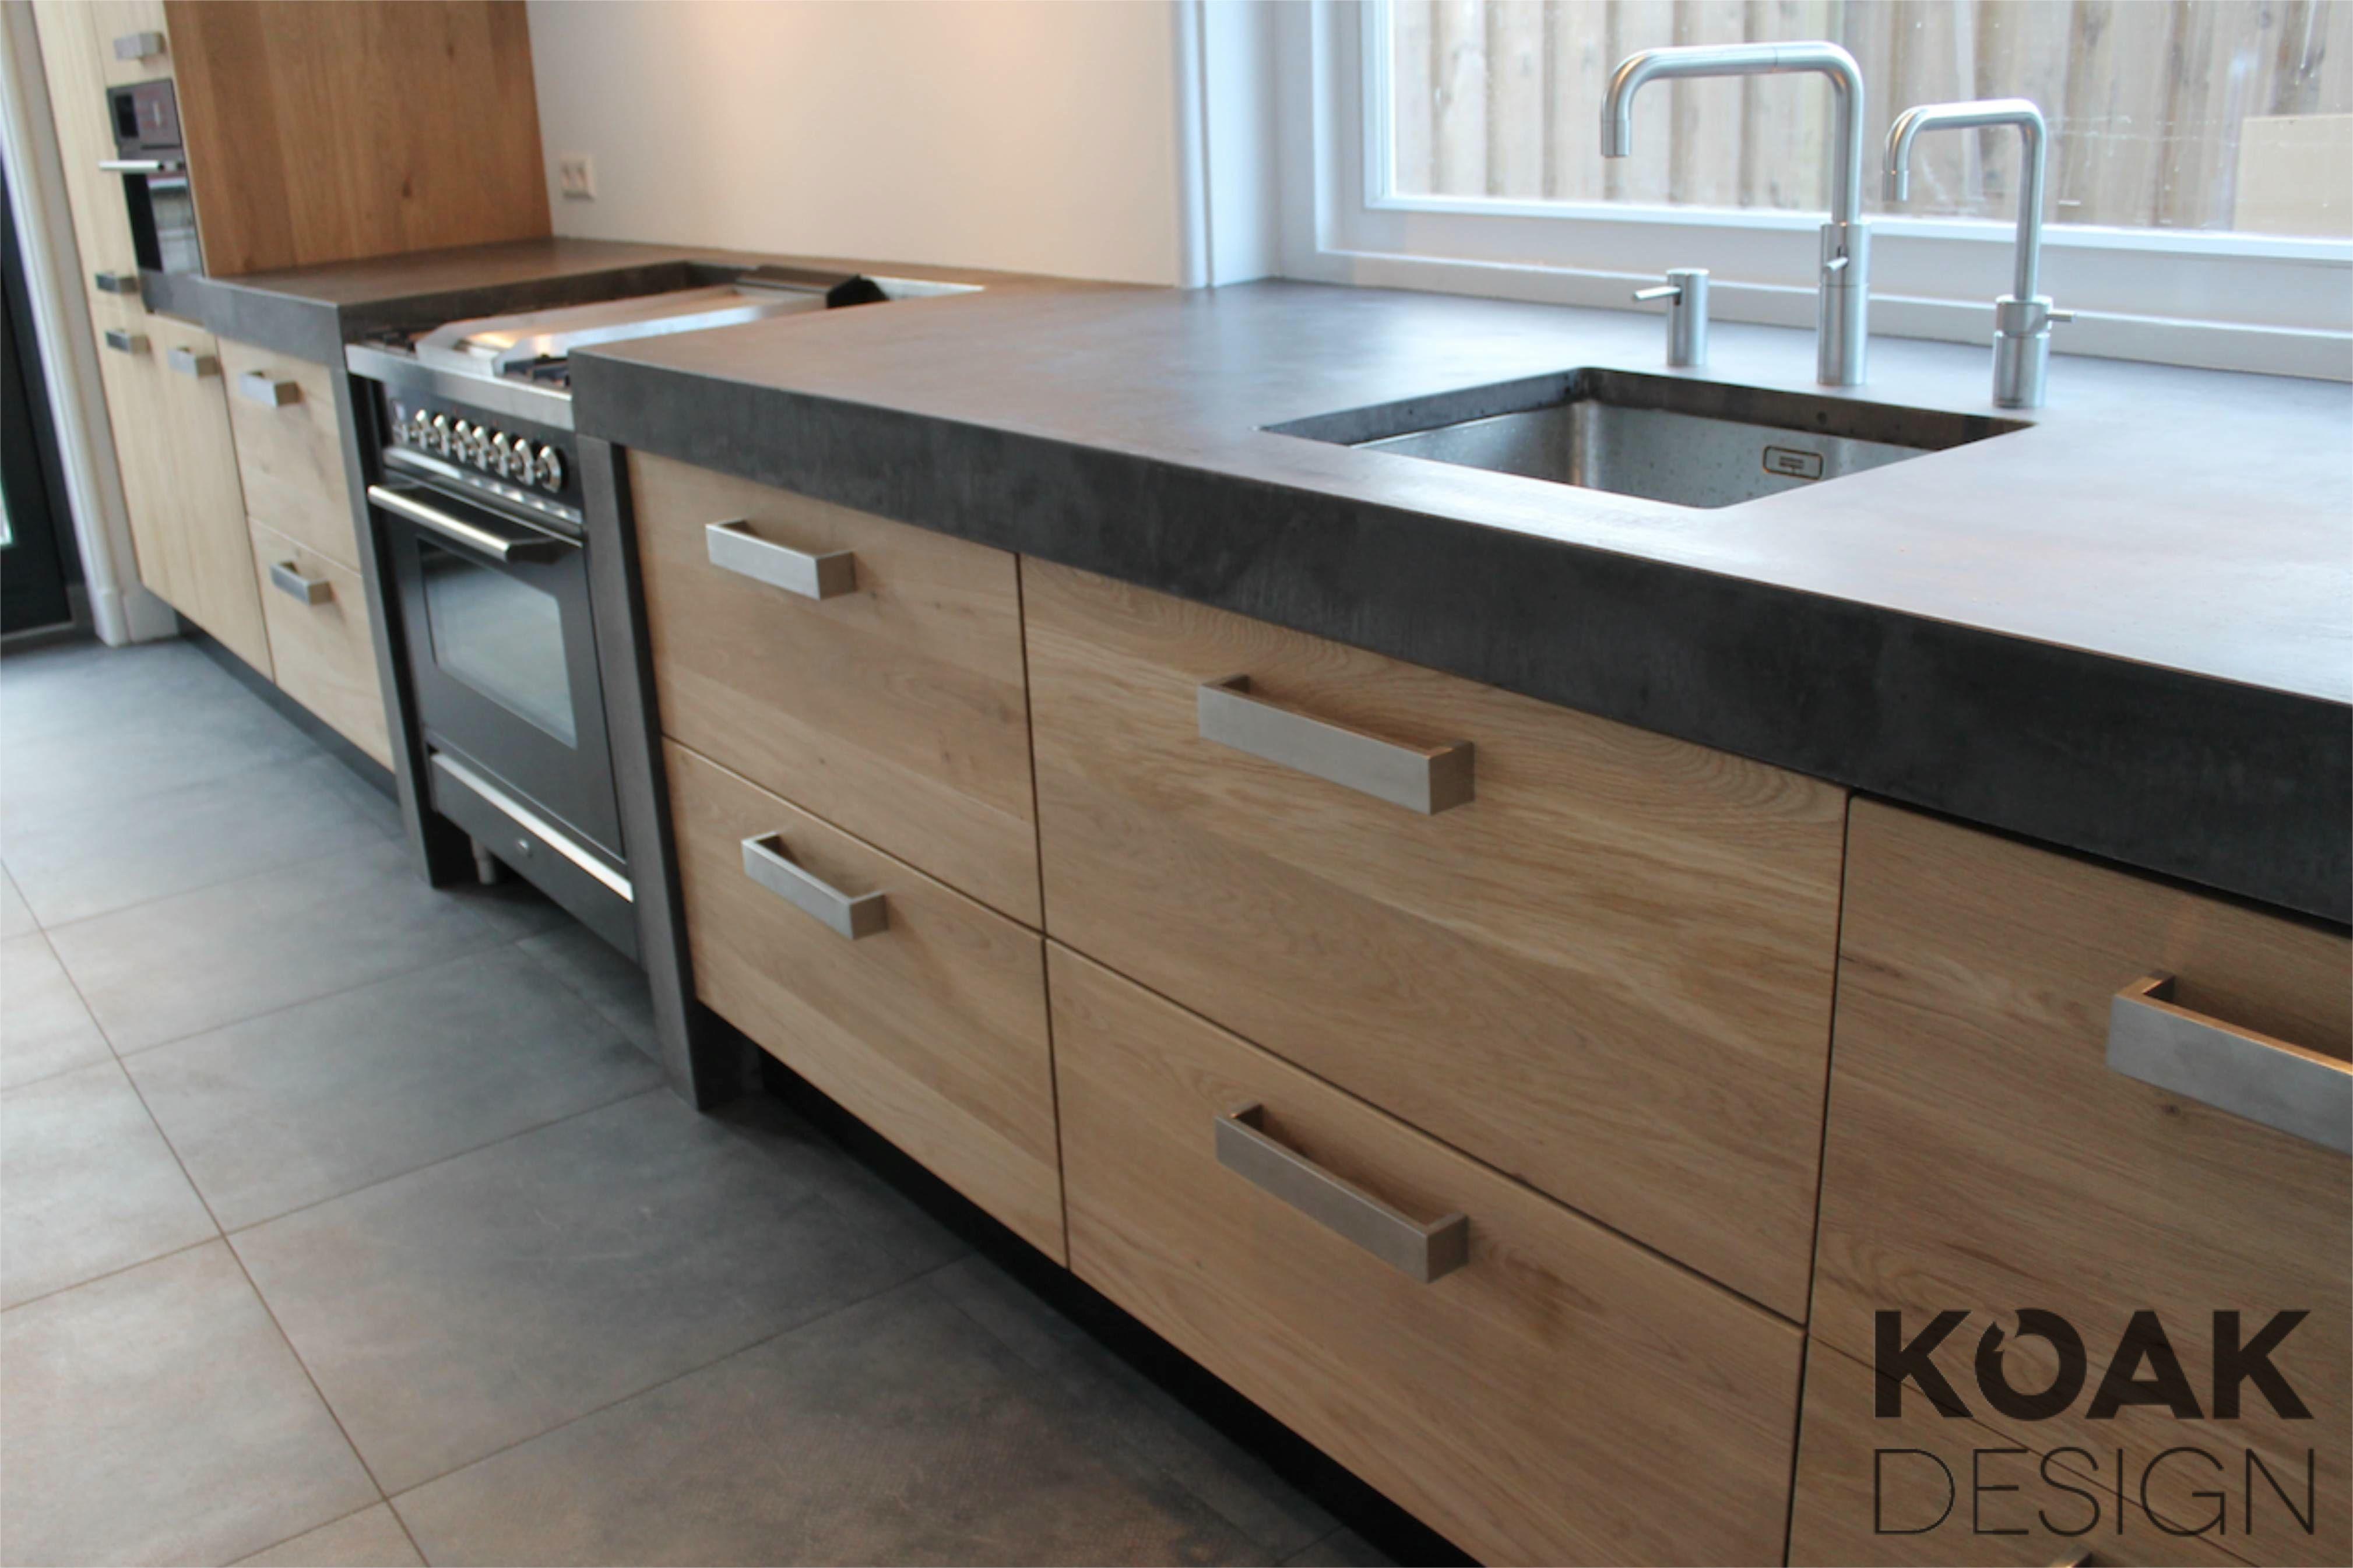 koak design ikea keuken real oak wooden doors ikea kitchen hack wooden doors for ikea kitchen. Black Bedroom Furniture Sets. Home Design Ideas